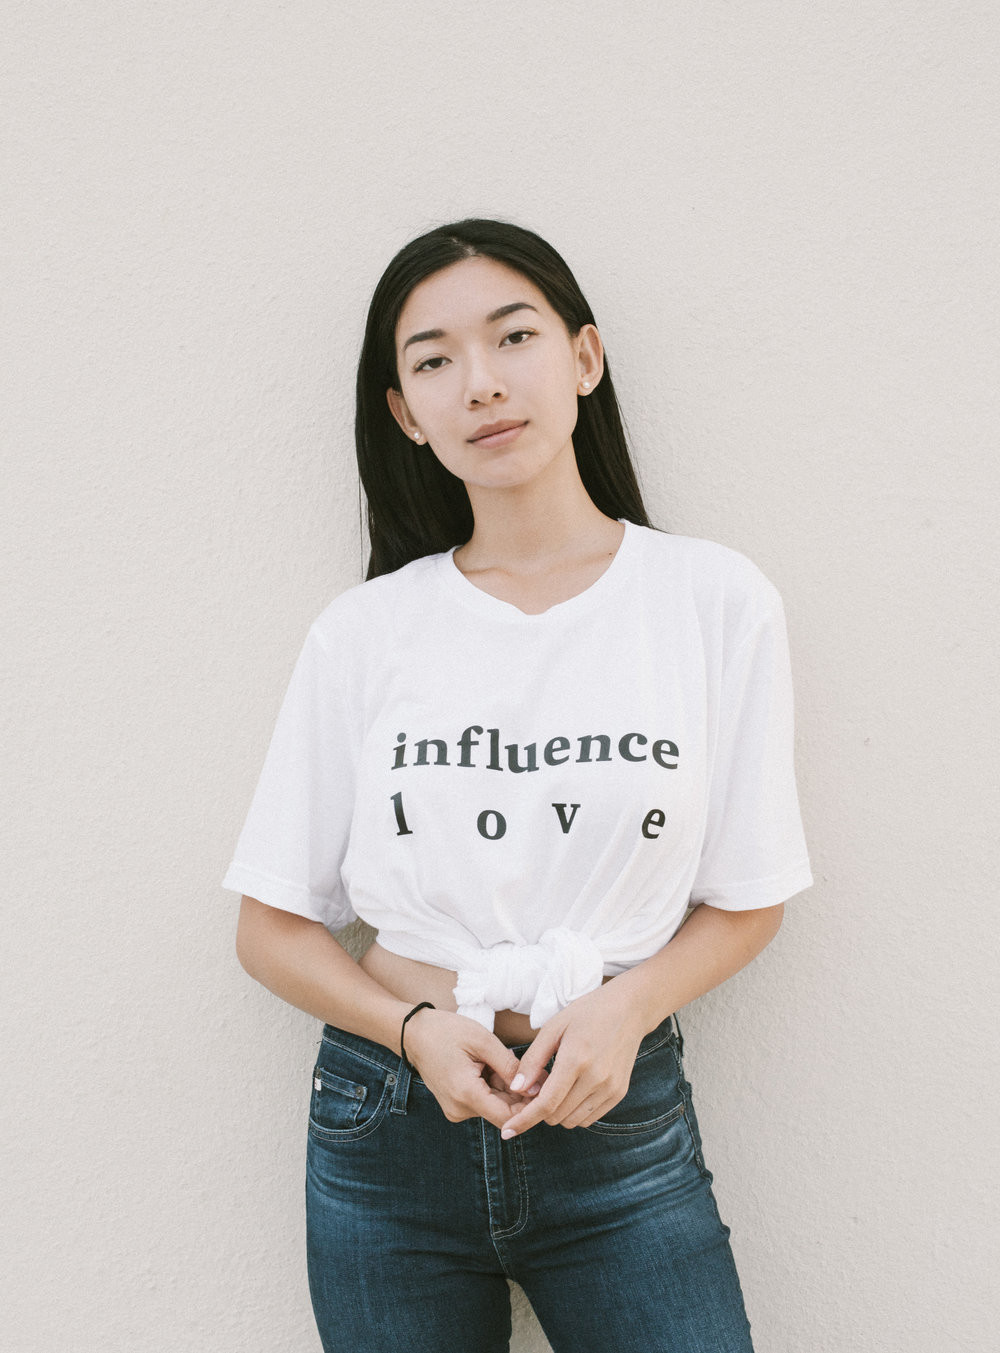 InfluenceLove Product-3 copy.jpg